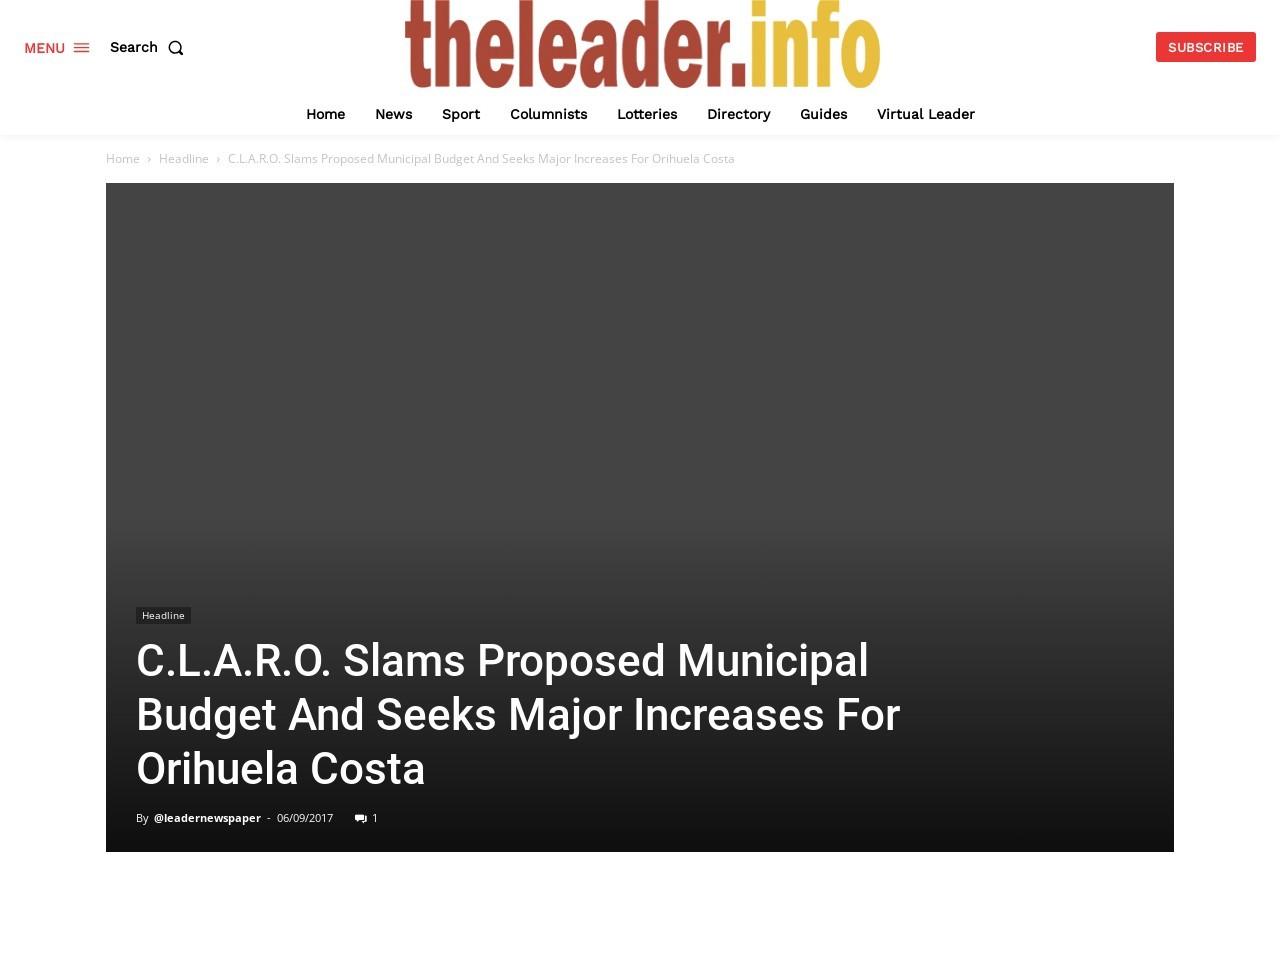 C.L.A.R.O. Slams Proposed Municipal Budget And Seeks Major Increases For Orihuela Costa